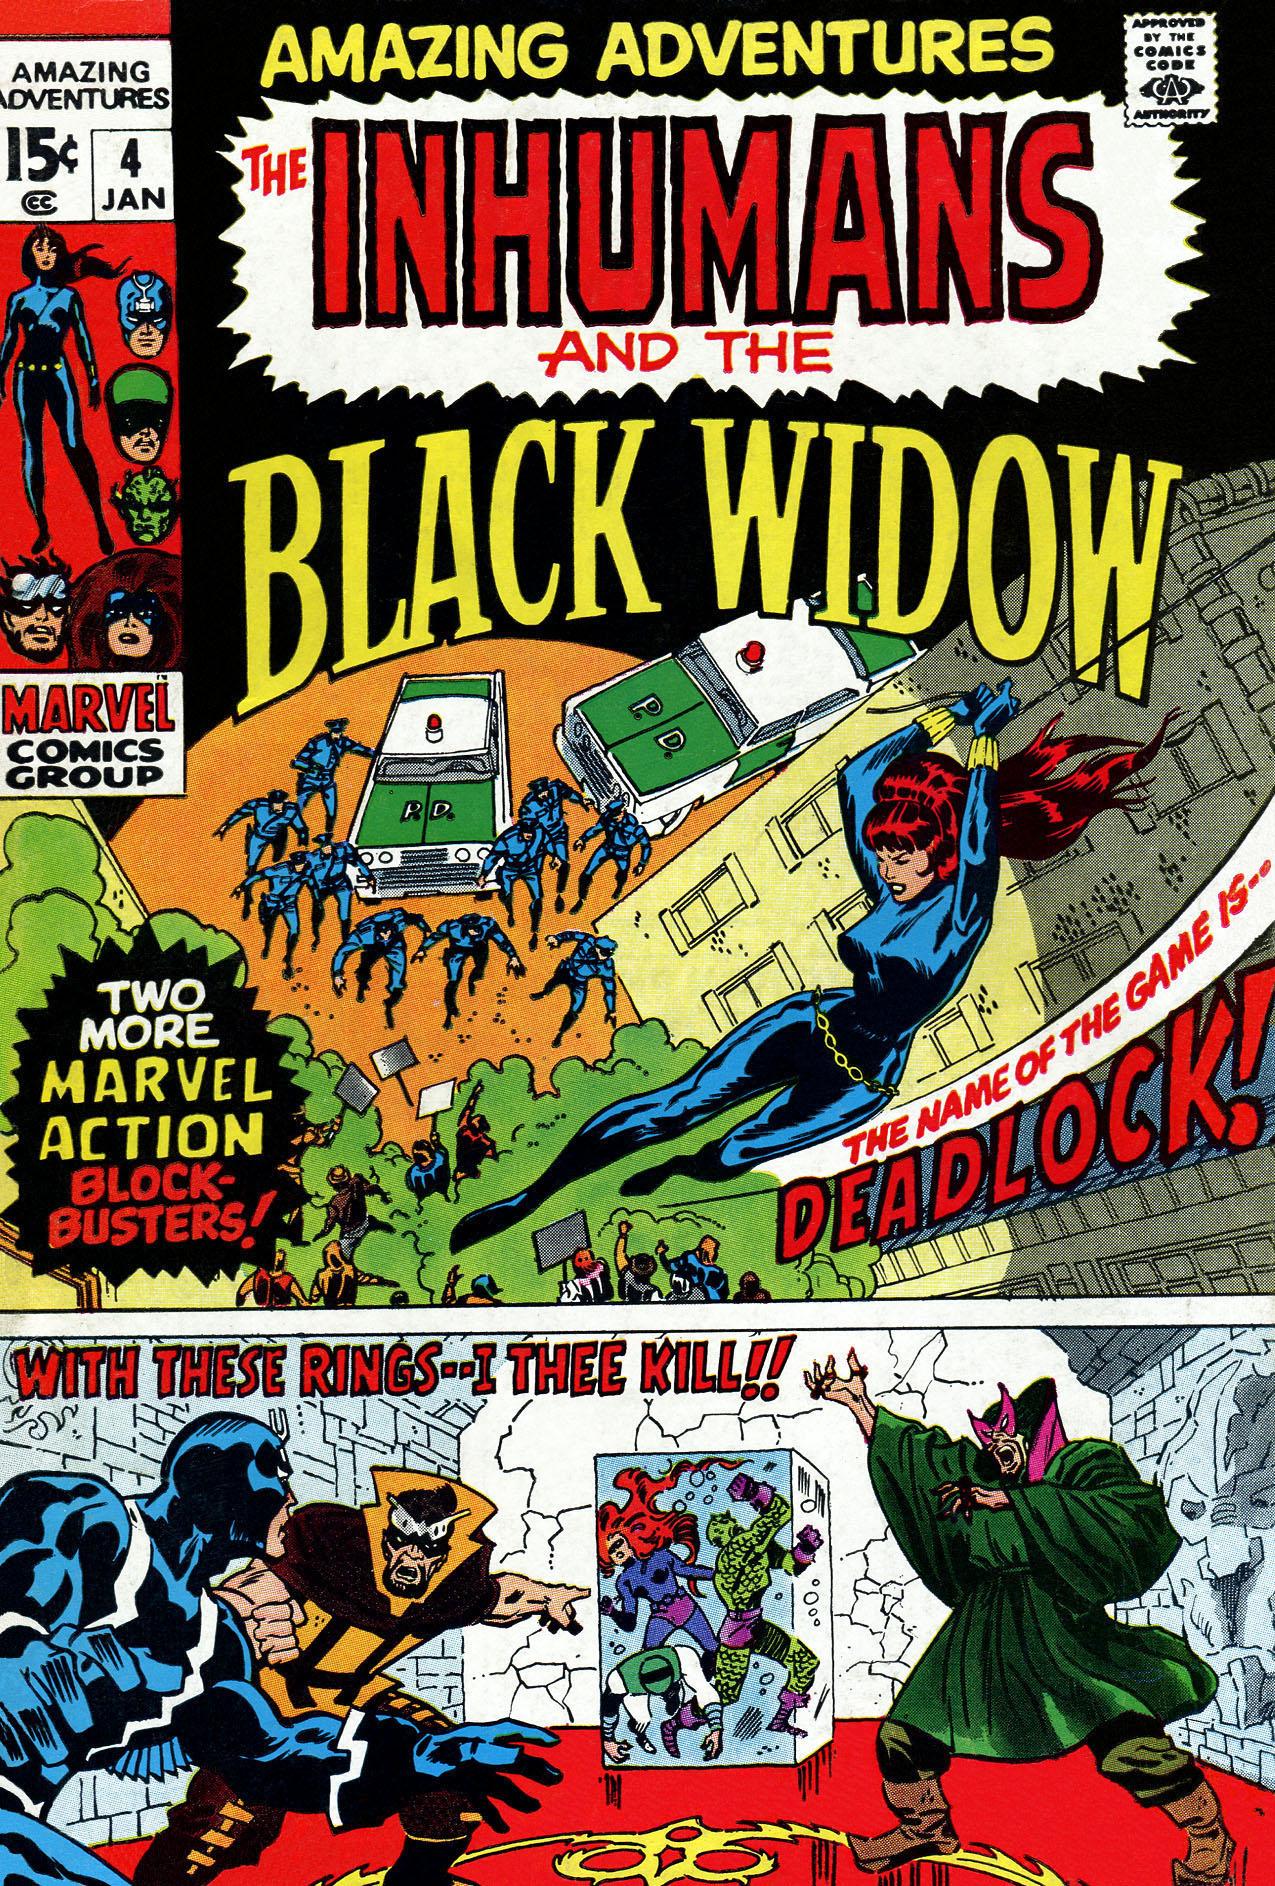 Read online Amazing Adventures (1970) comic -  Issue #4 - 1